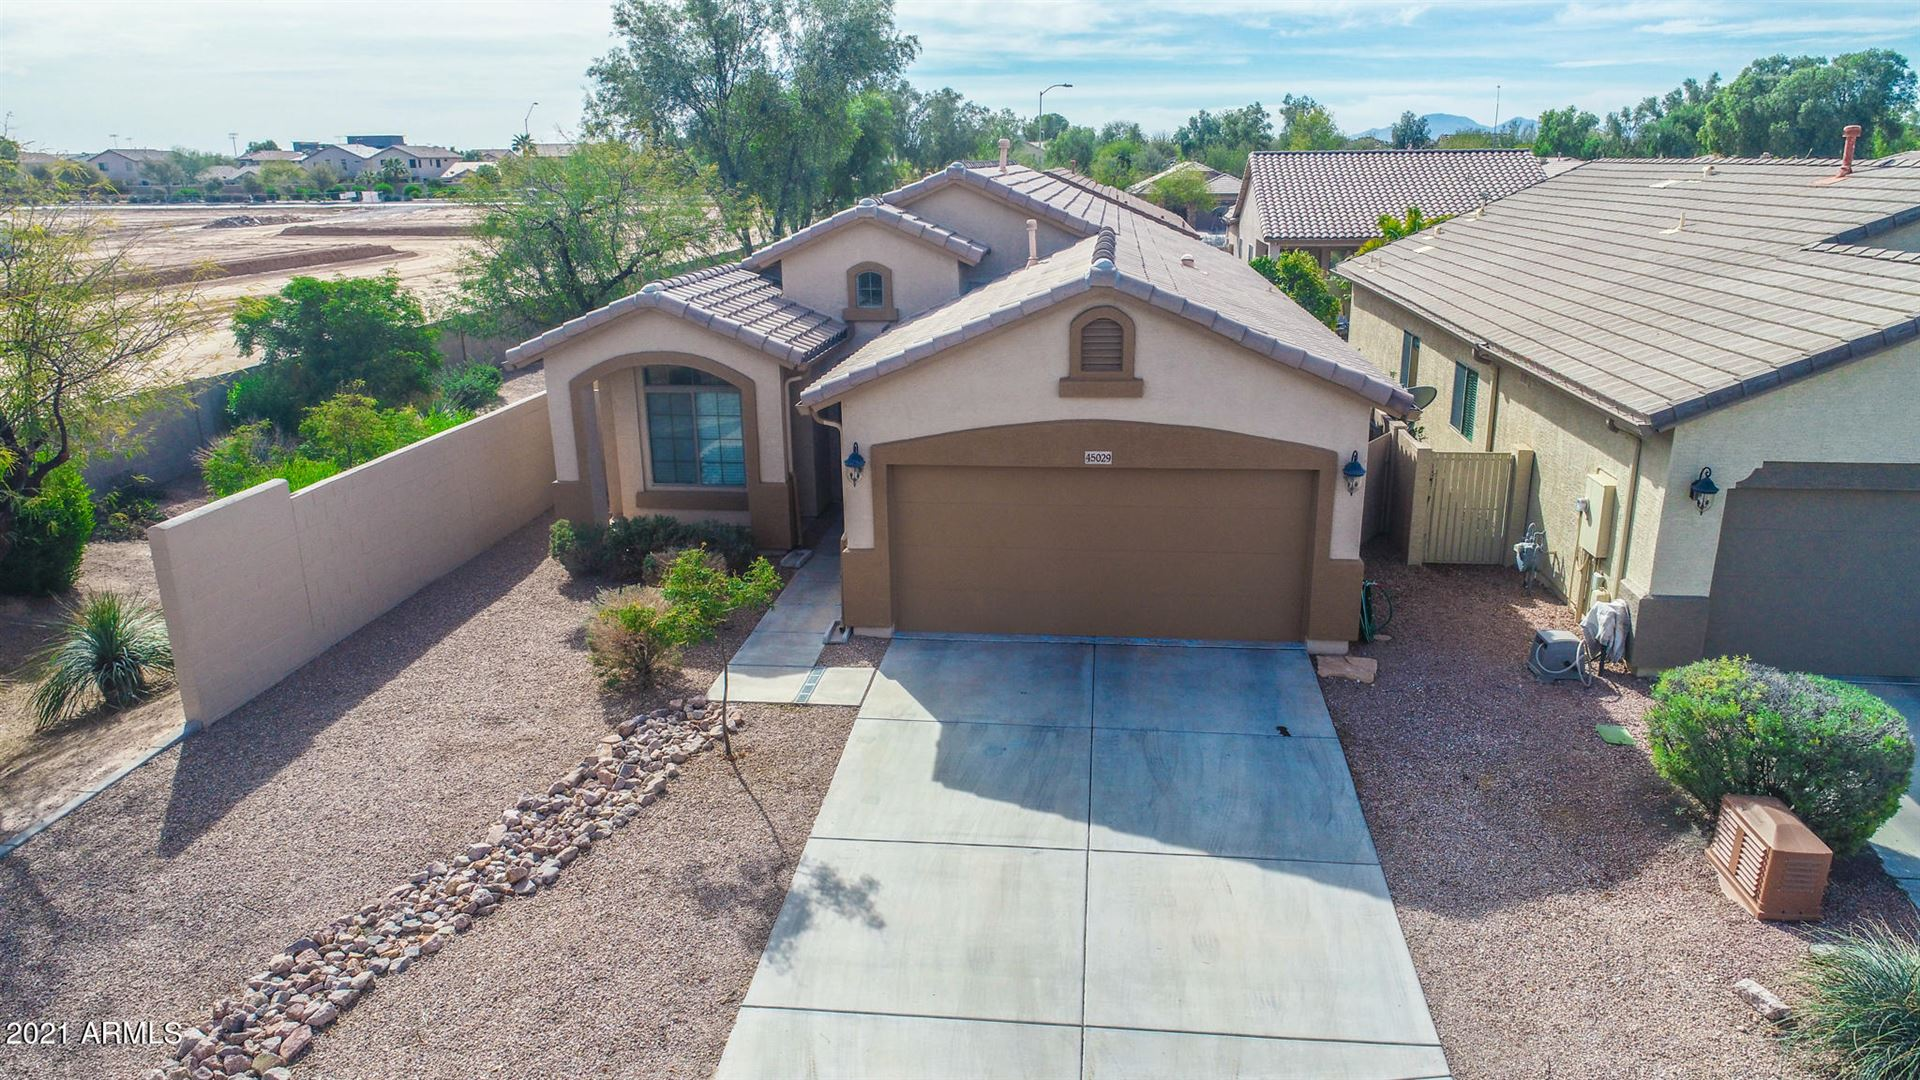 Photo of 45029 W YUCCA Lane, Maricopa, AZ 85139 (MLS # 6200716)